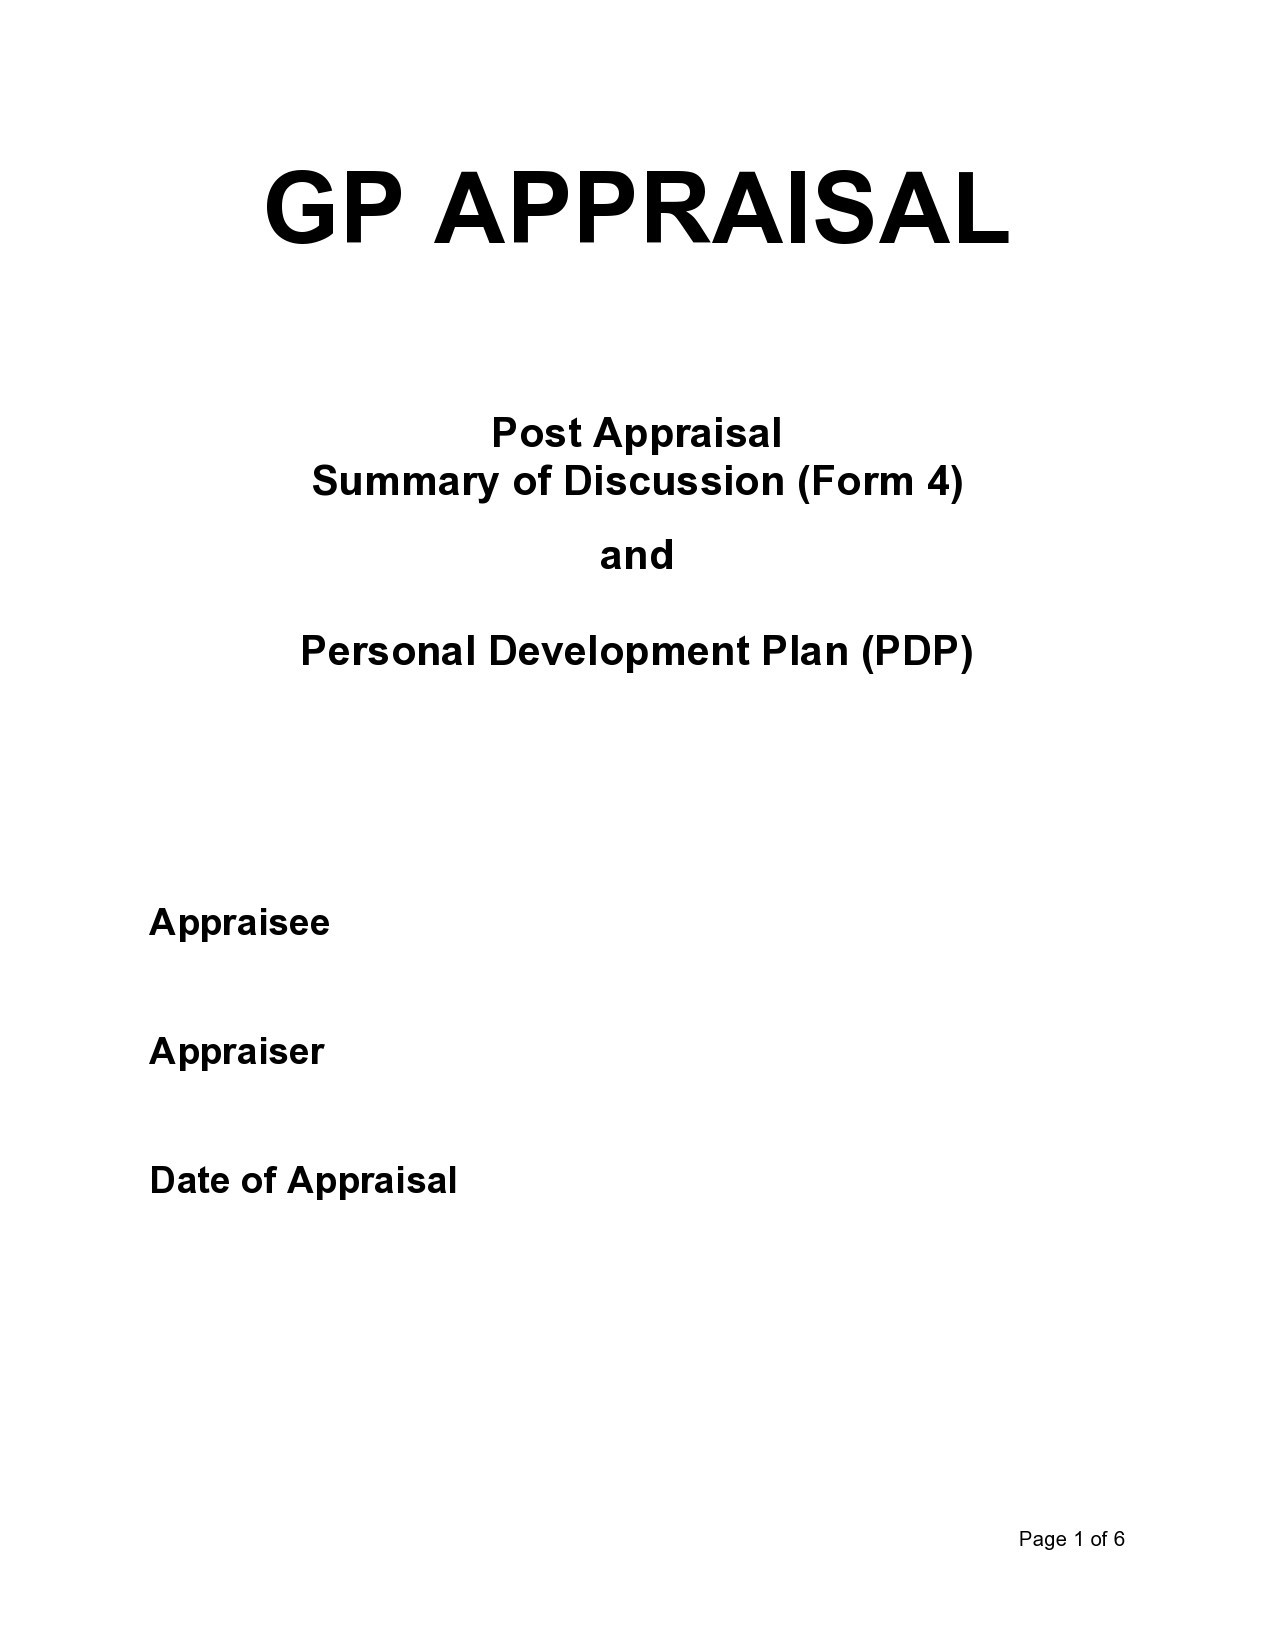 Free professional development plan 42